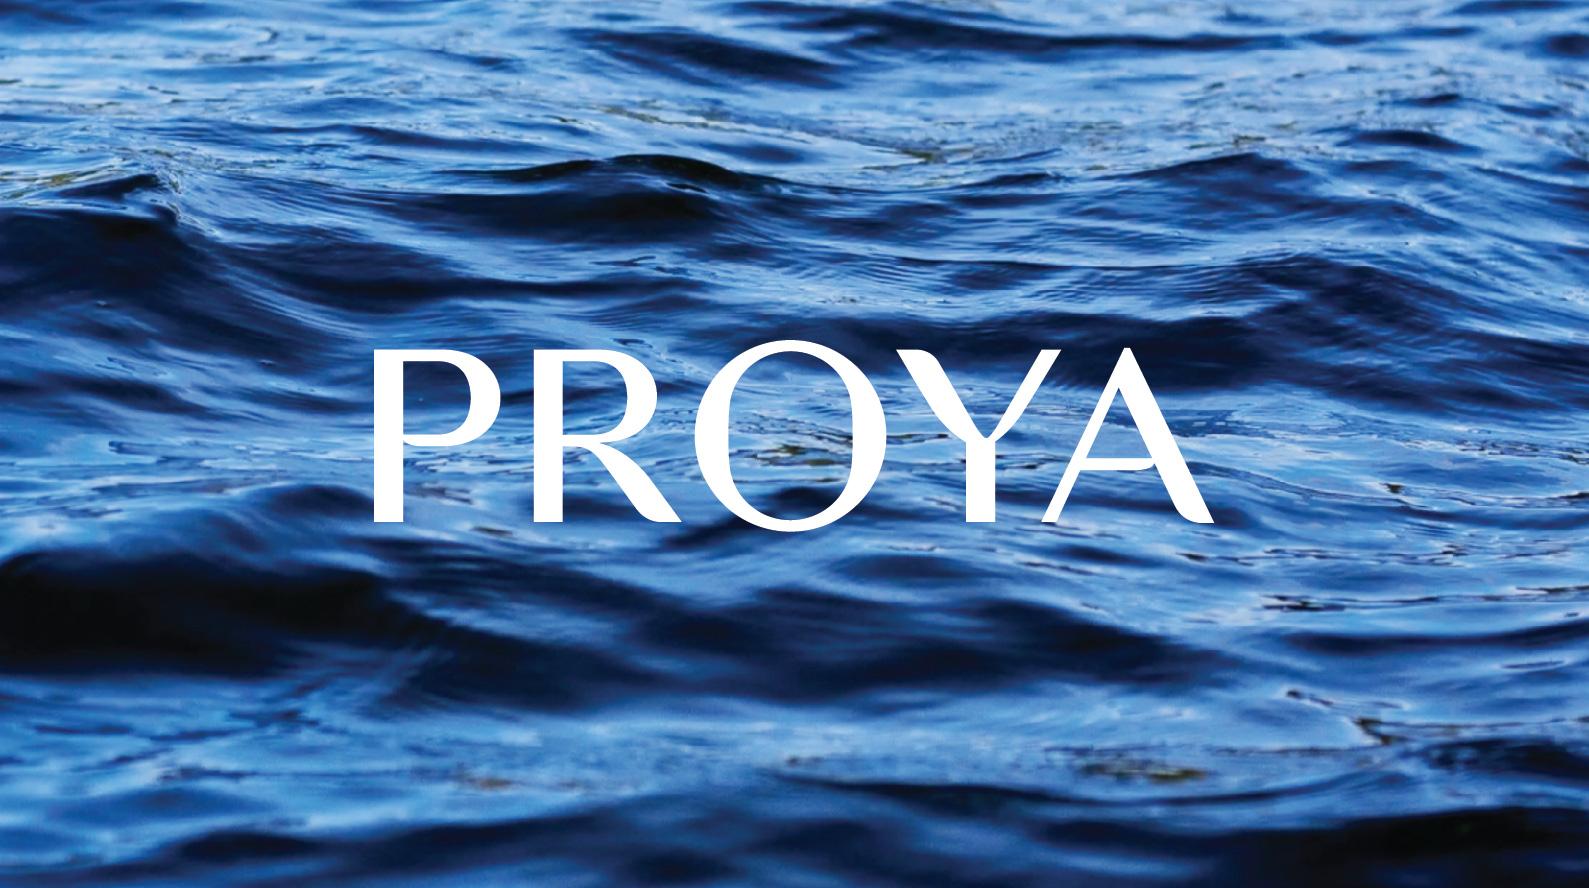 proya_00-4.jpg